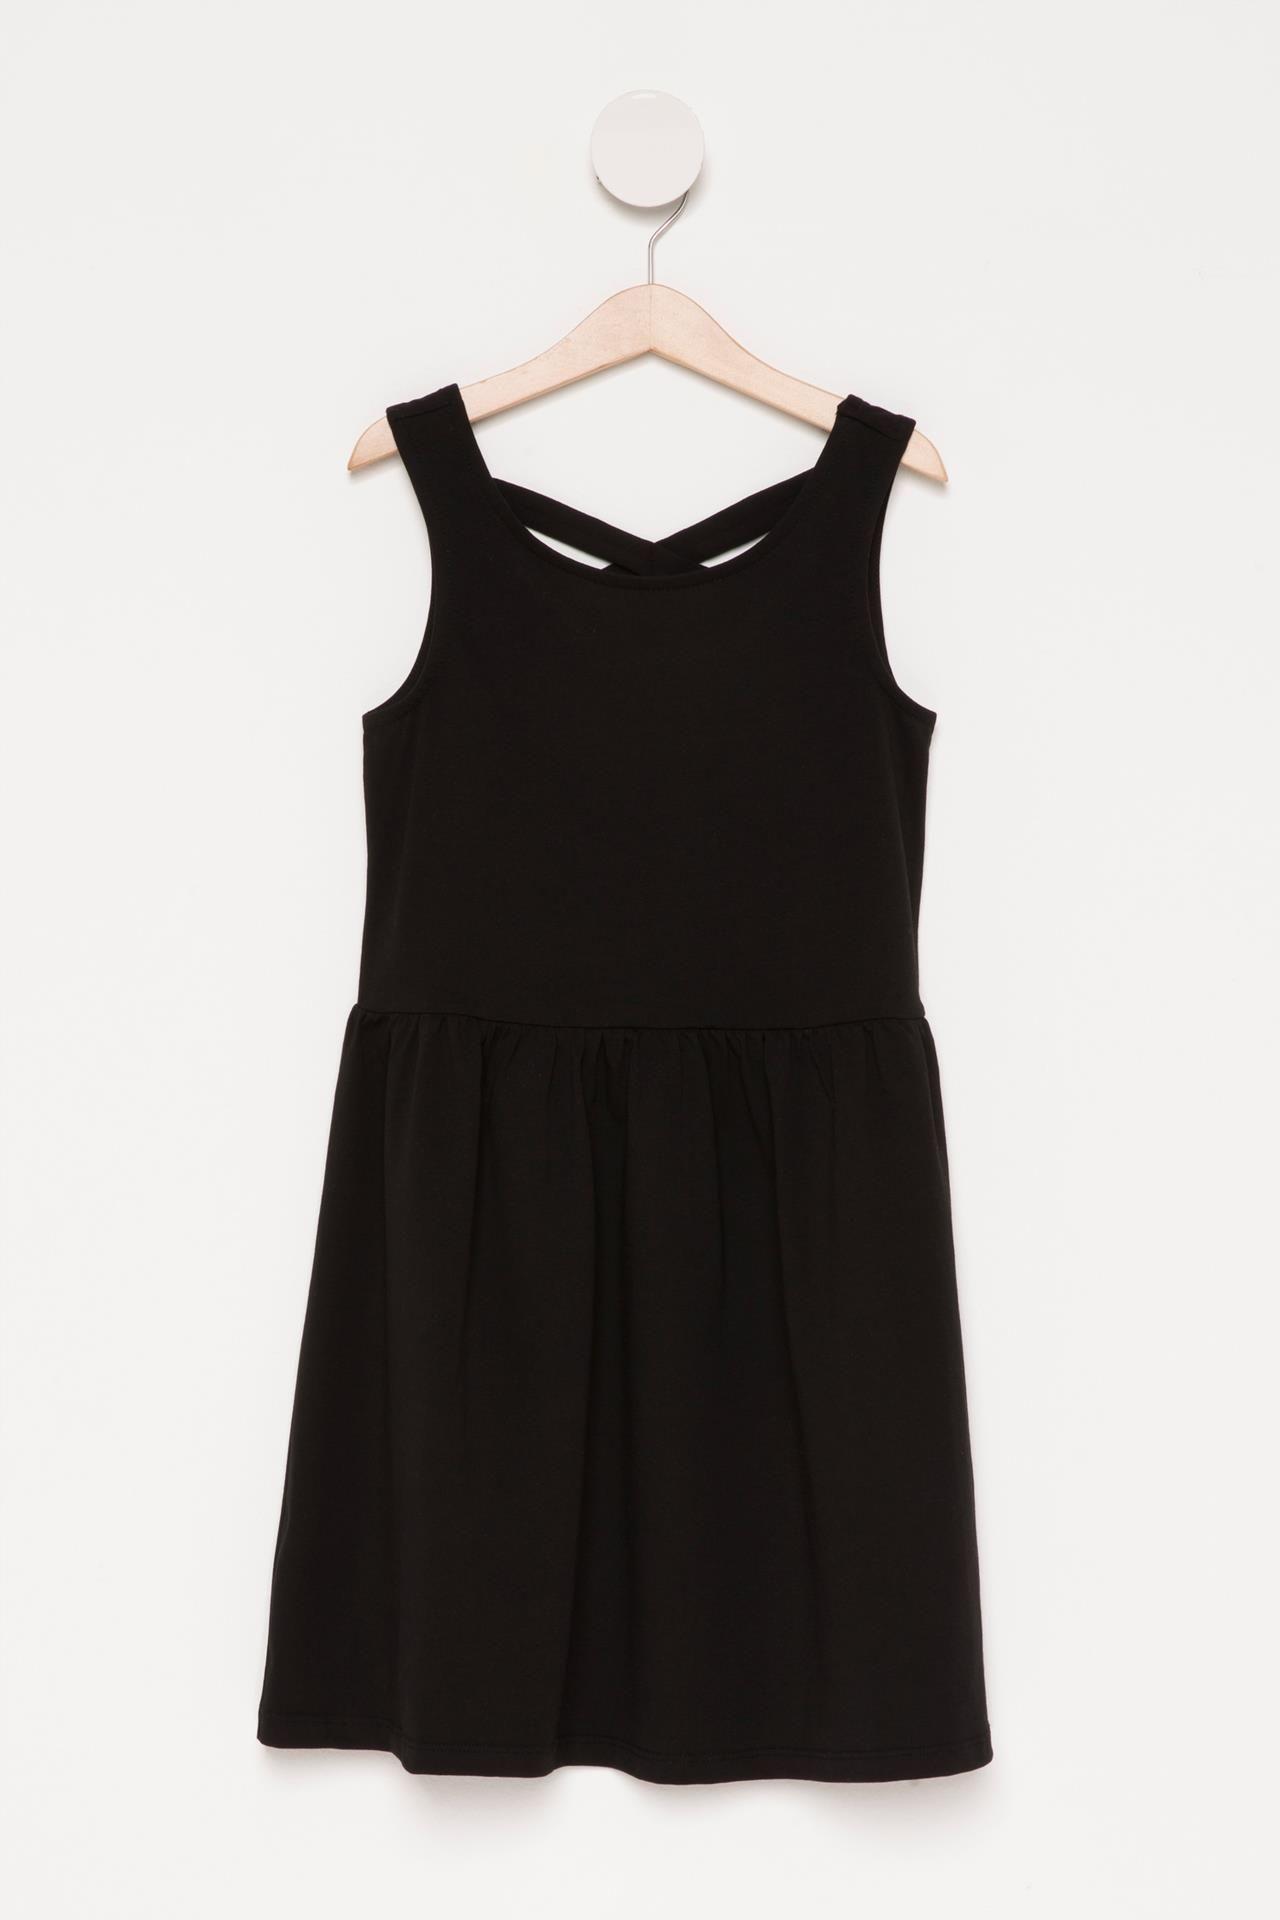 Siyah Genc Kiz Genc Kiz Elbise 748968 Defacto Moda Elbise Kadin